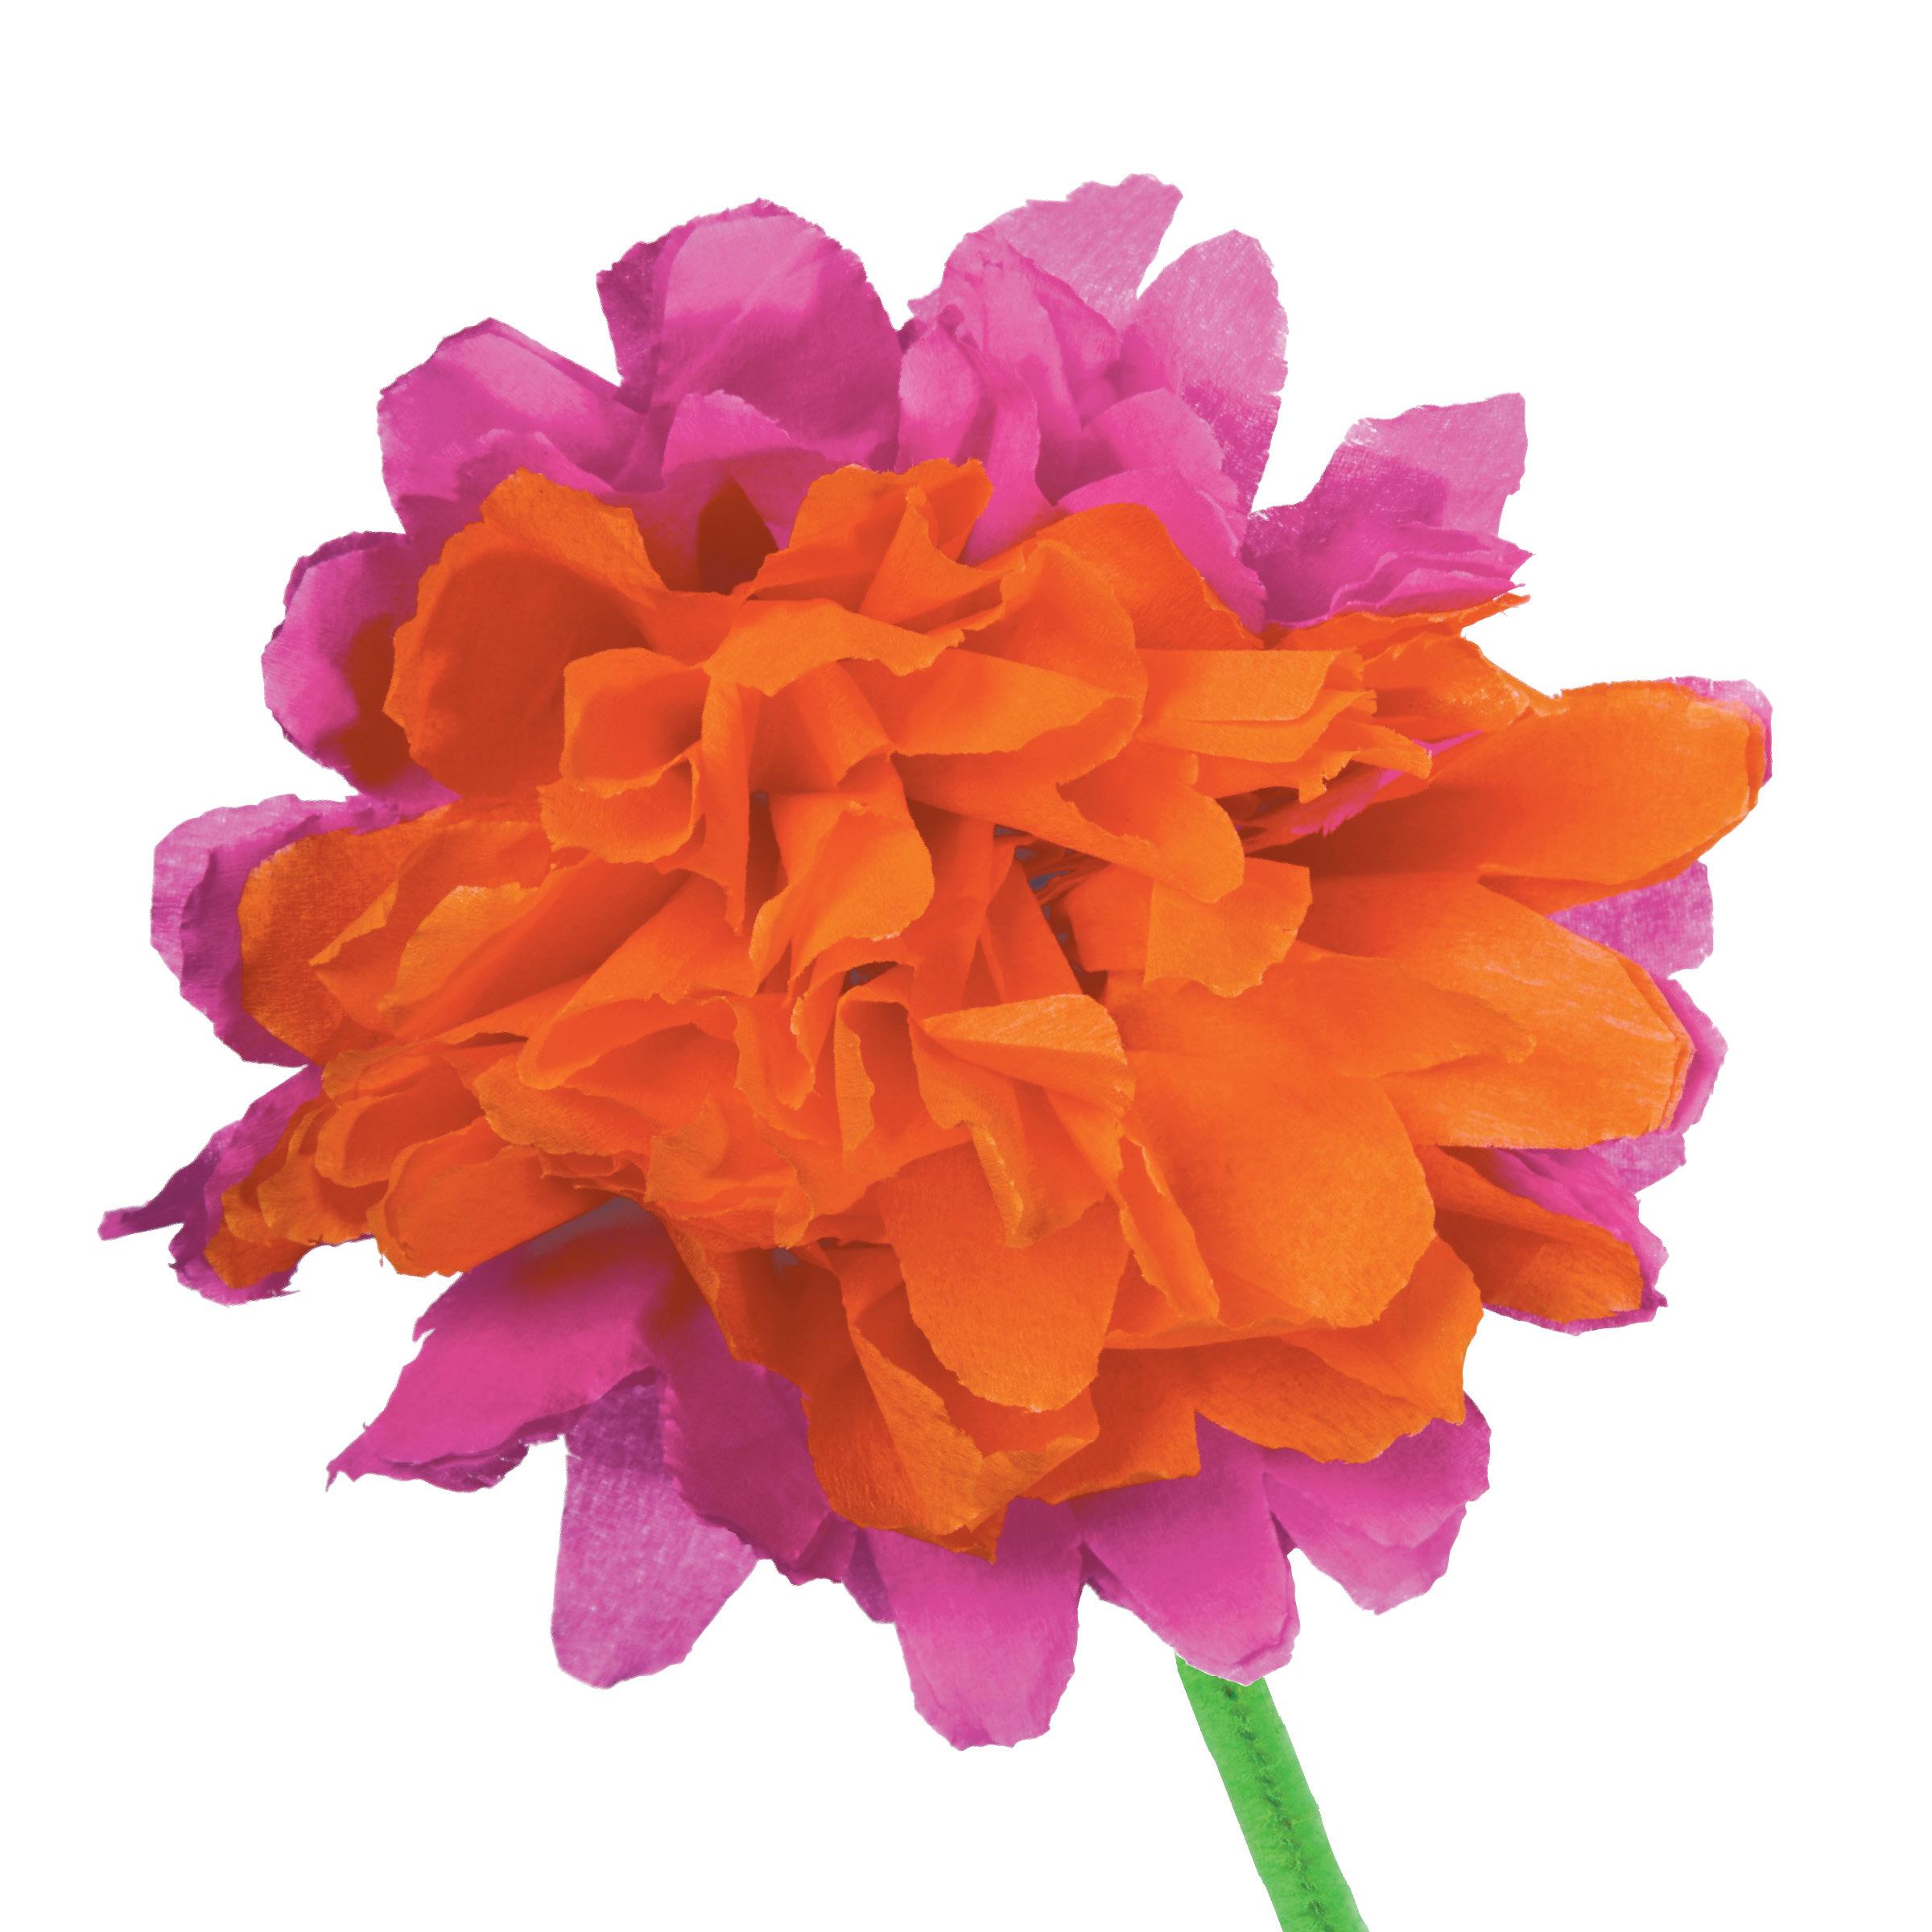 eeBoo Studio Crepe Paper Flowers